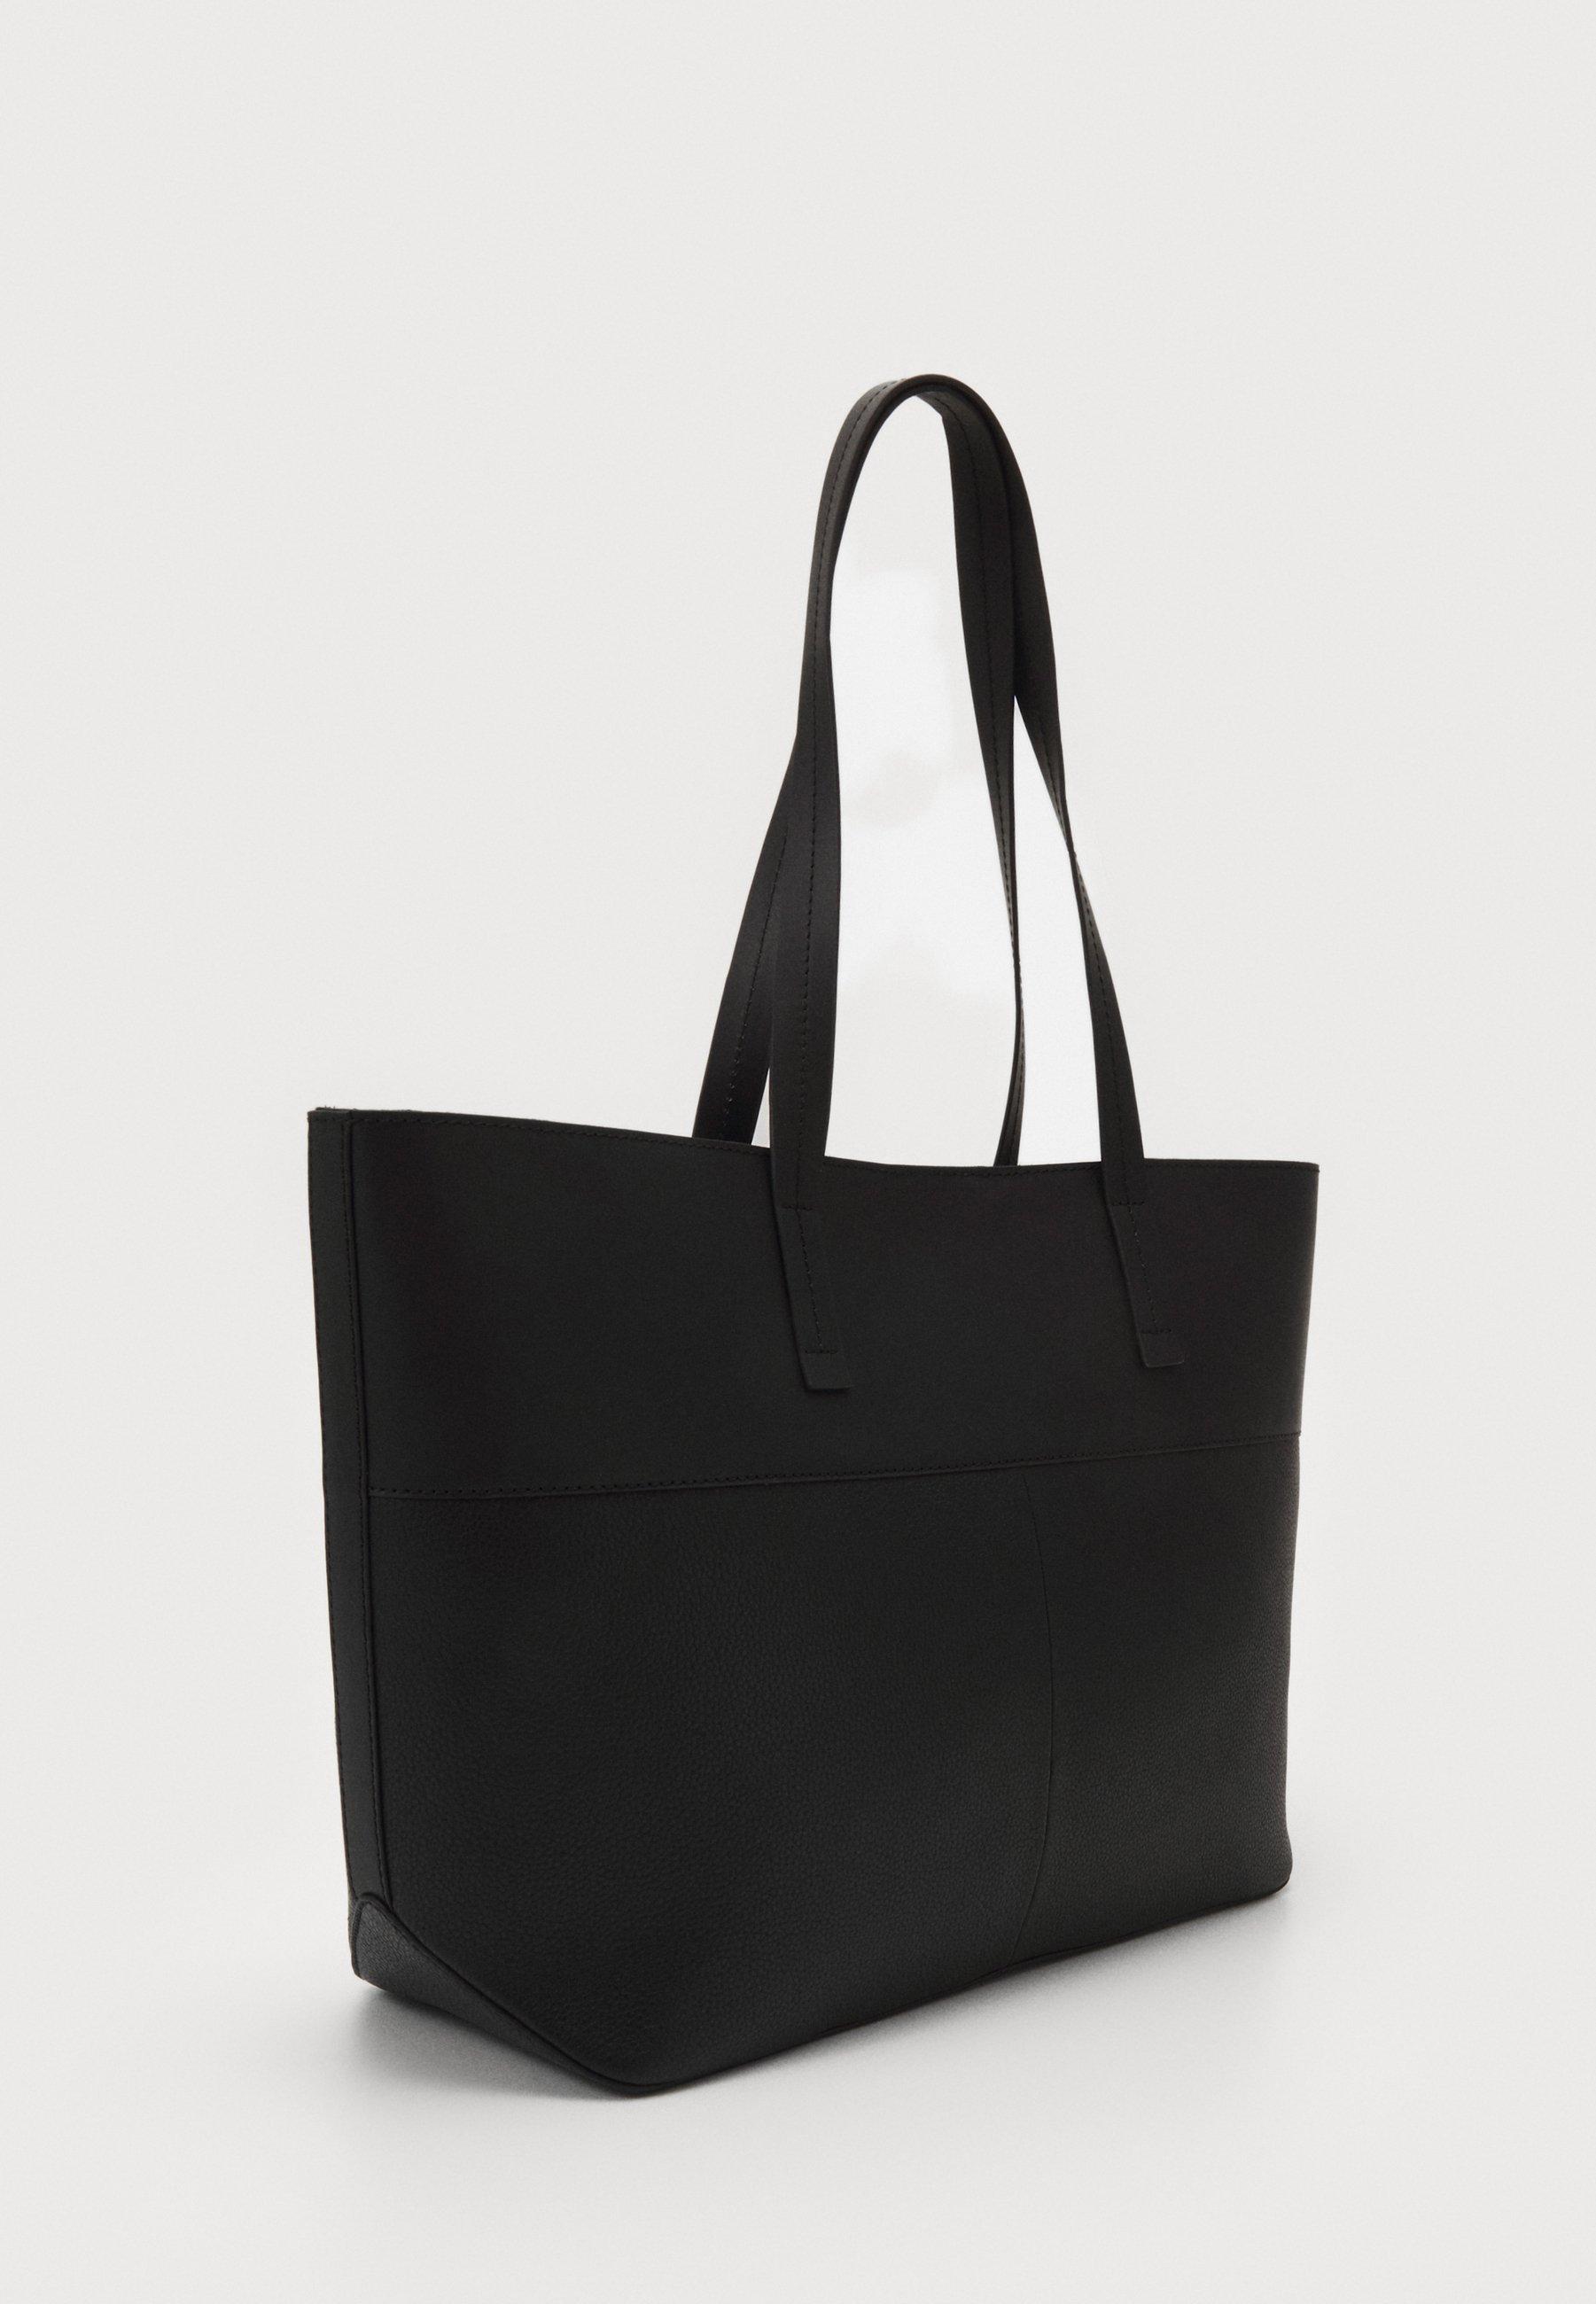 Zign Leather - Shopping Bag Black/schwarz